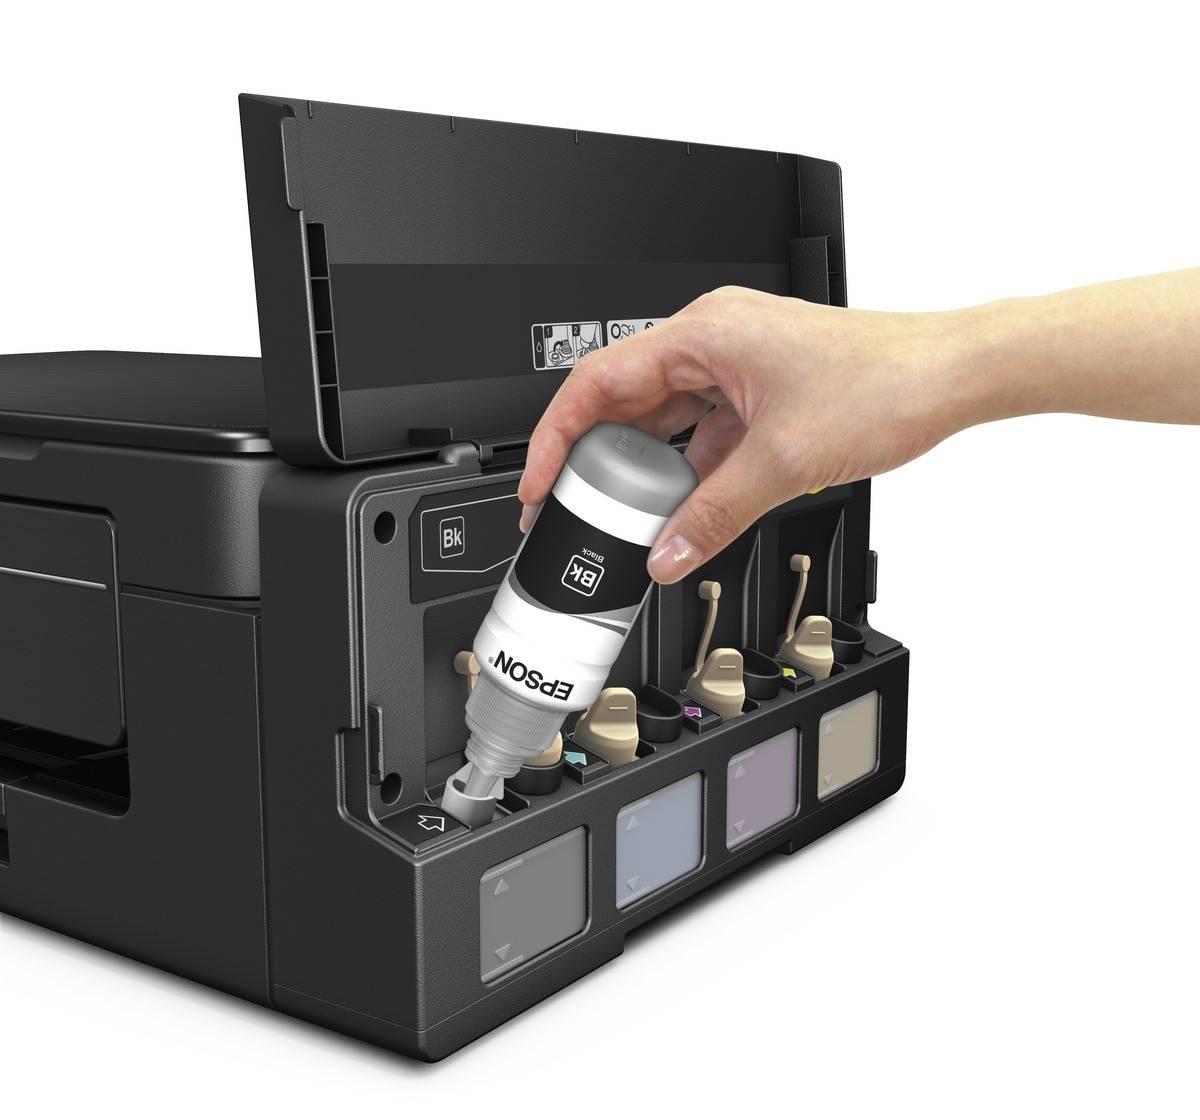 Impressora Multifuncional EcoTank L495 Epson 24499